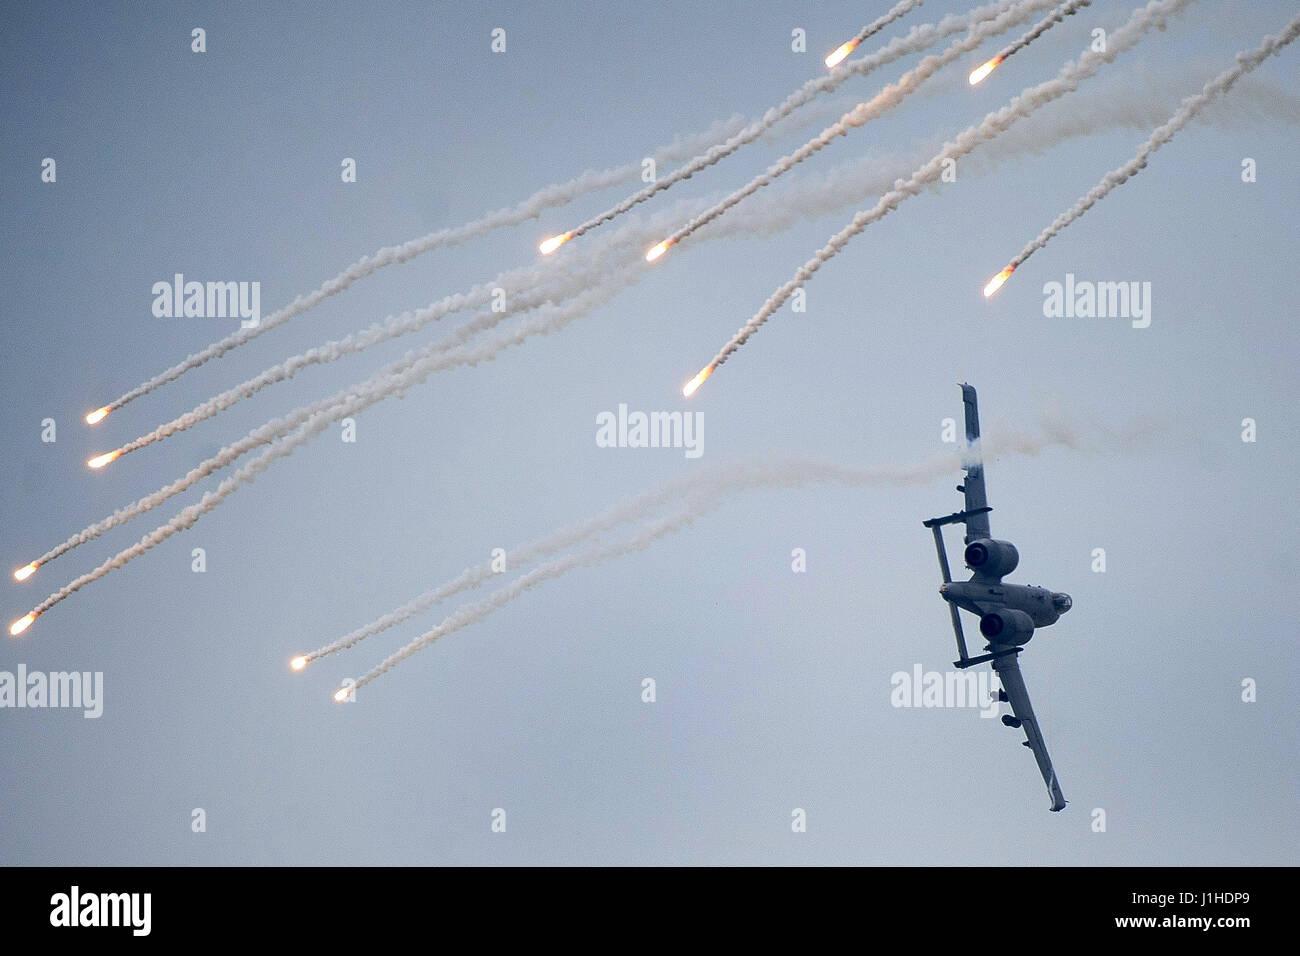 An A-10 Thunderbolt II shoots flares - Stock Image